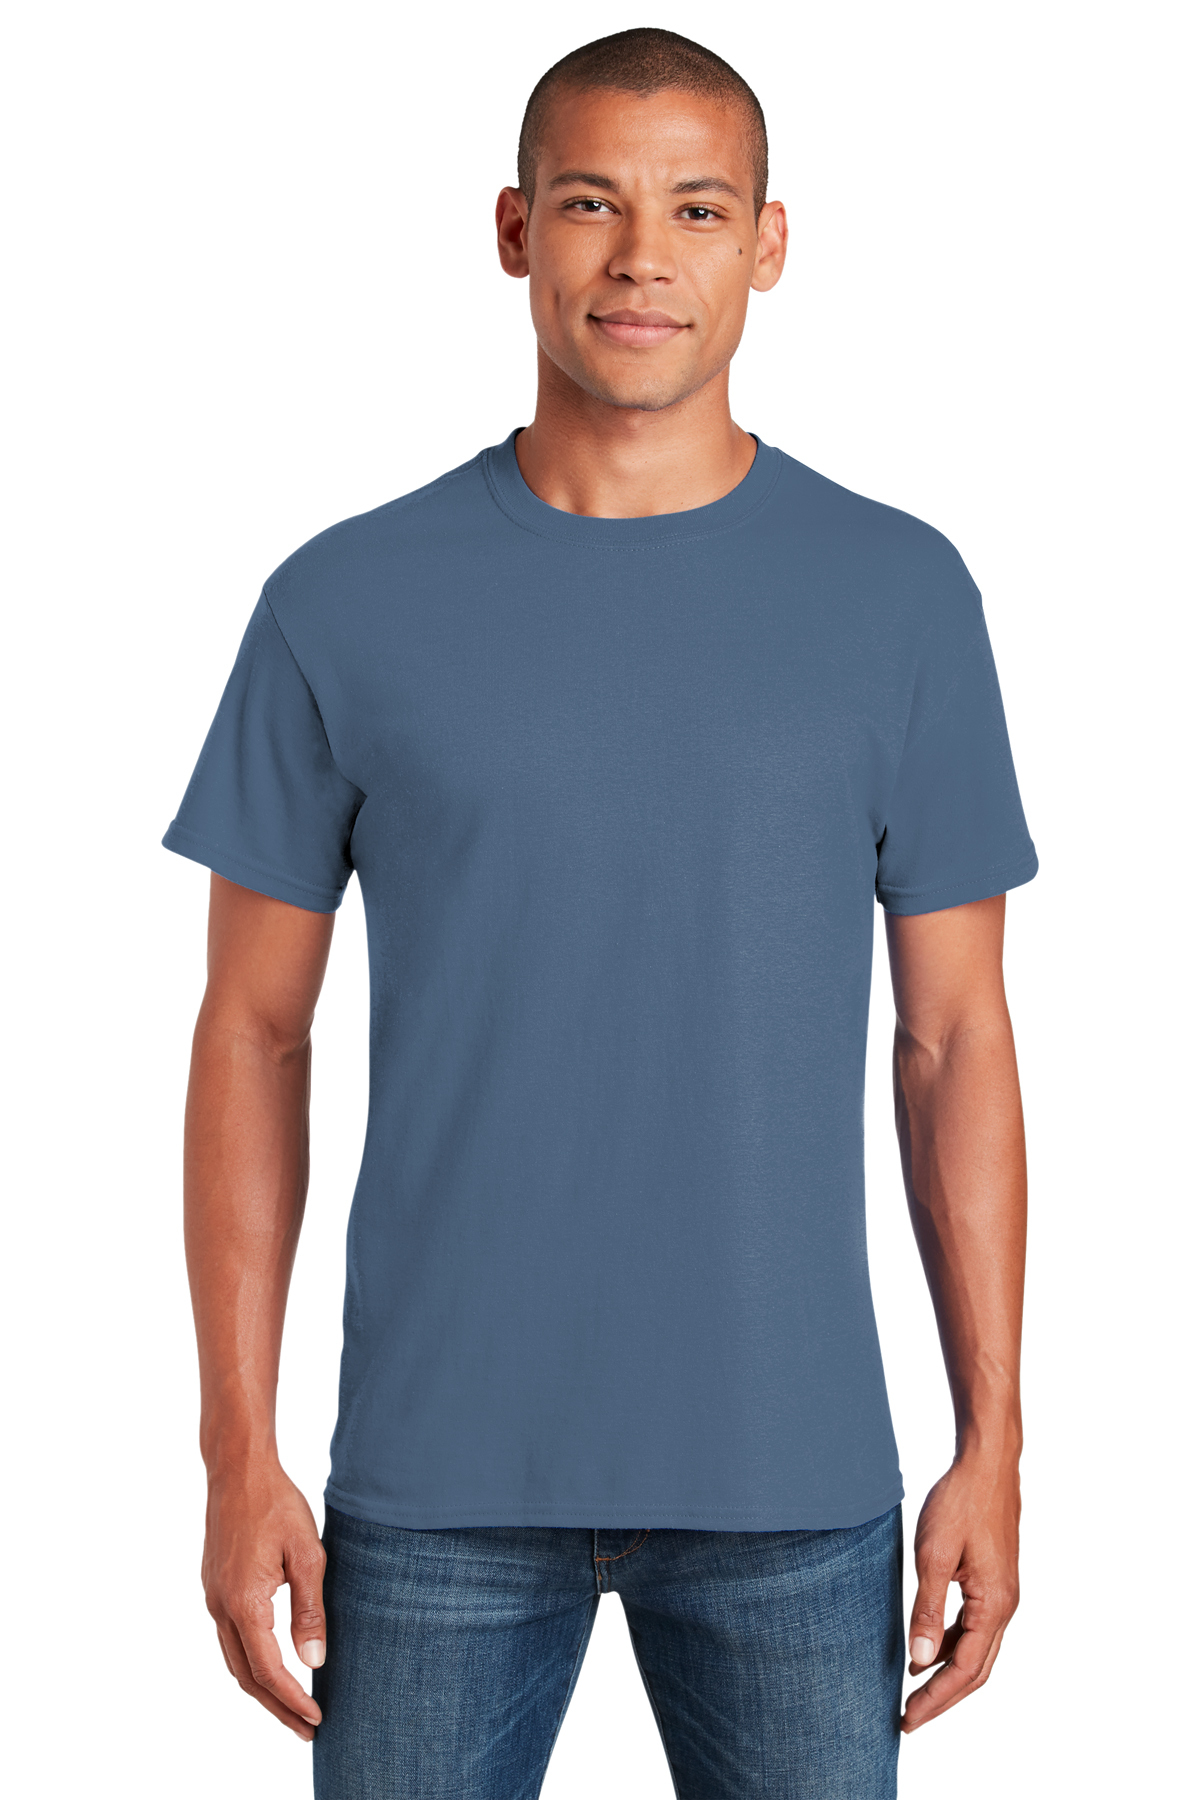 Gildan - Heavy Cotton 100% Cotton T-Shirt